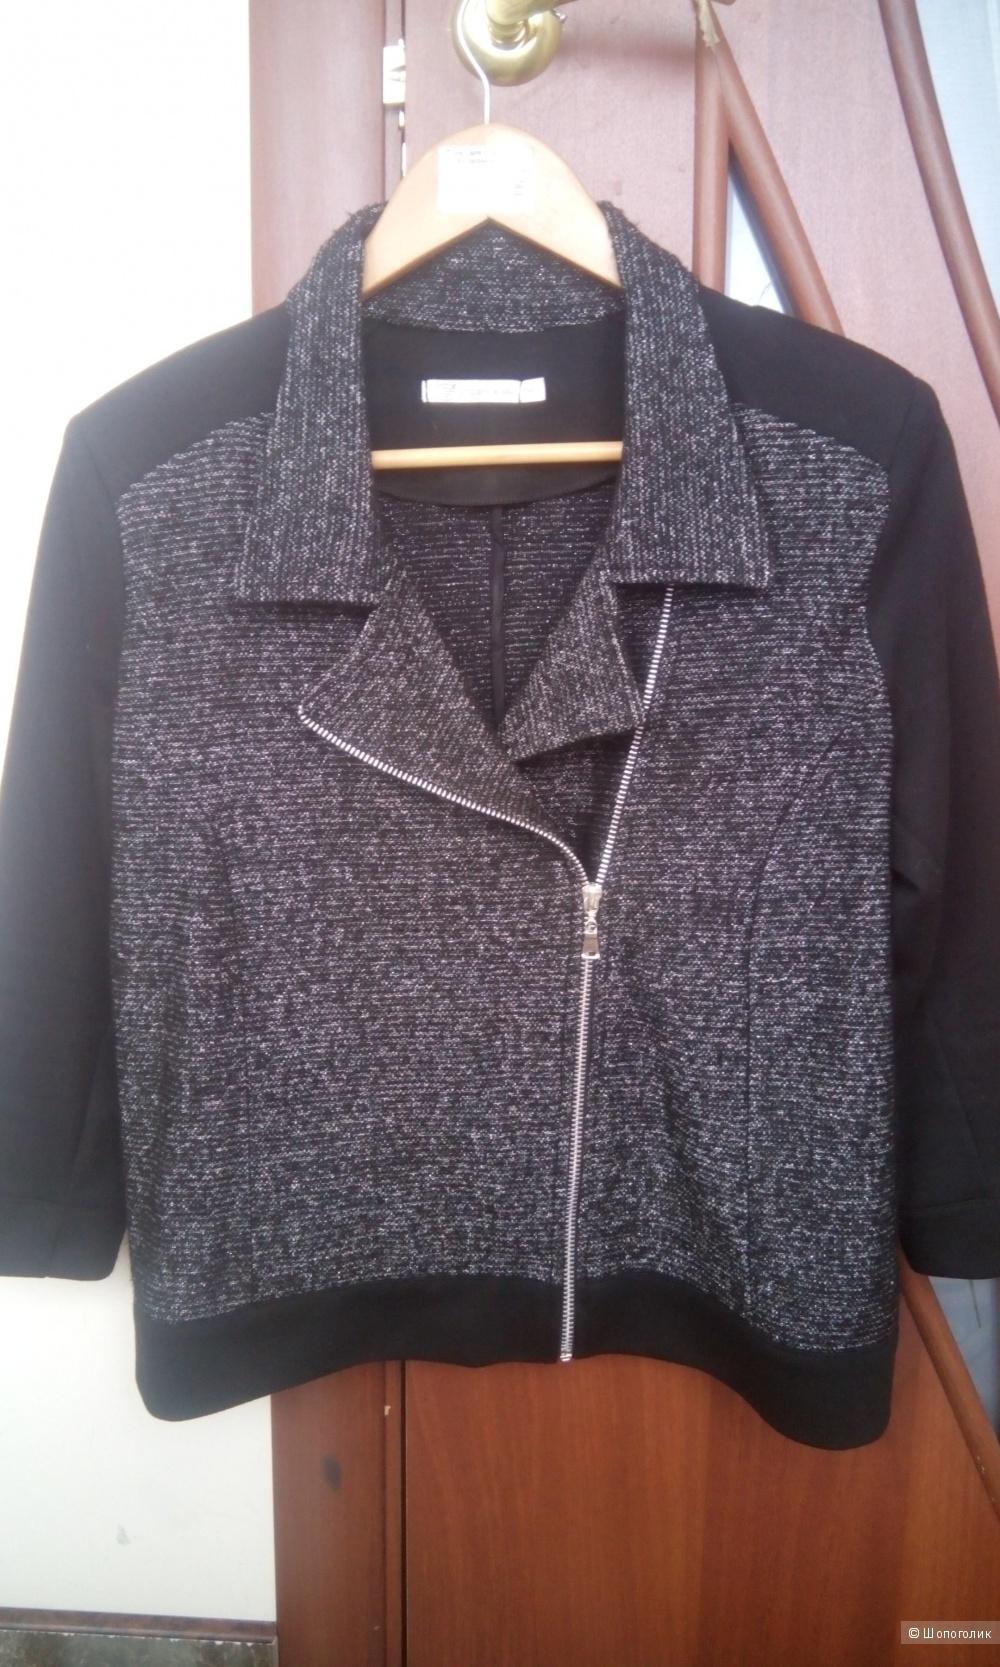 Симпатичный пиджачок, кофта, косуха французской фирмы Urban by gemo размер М